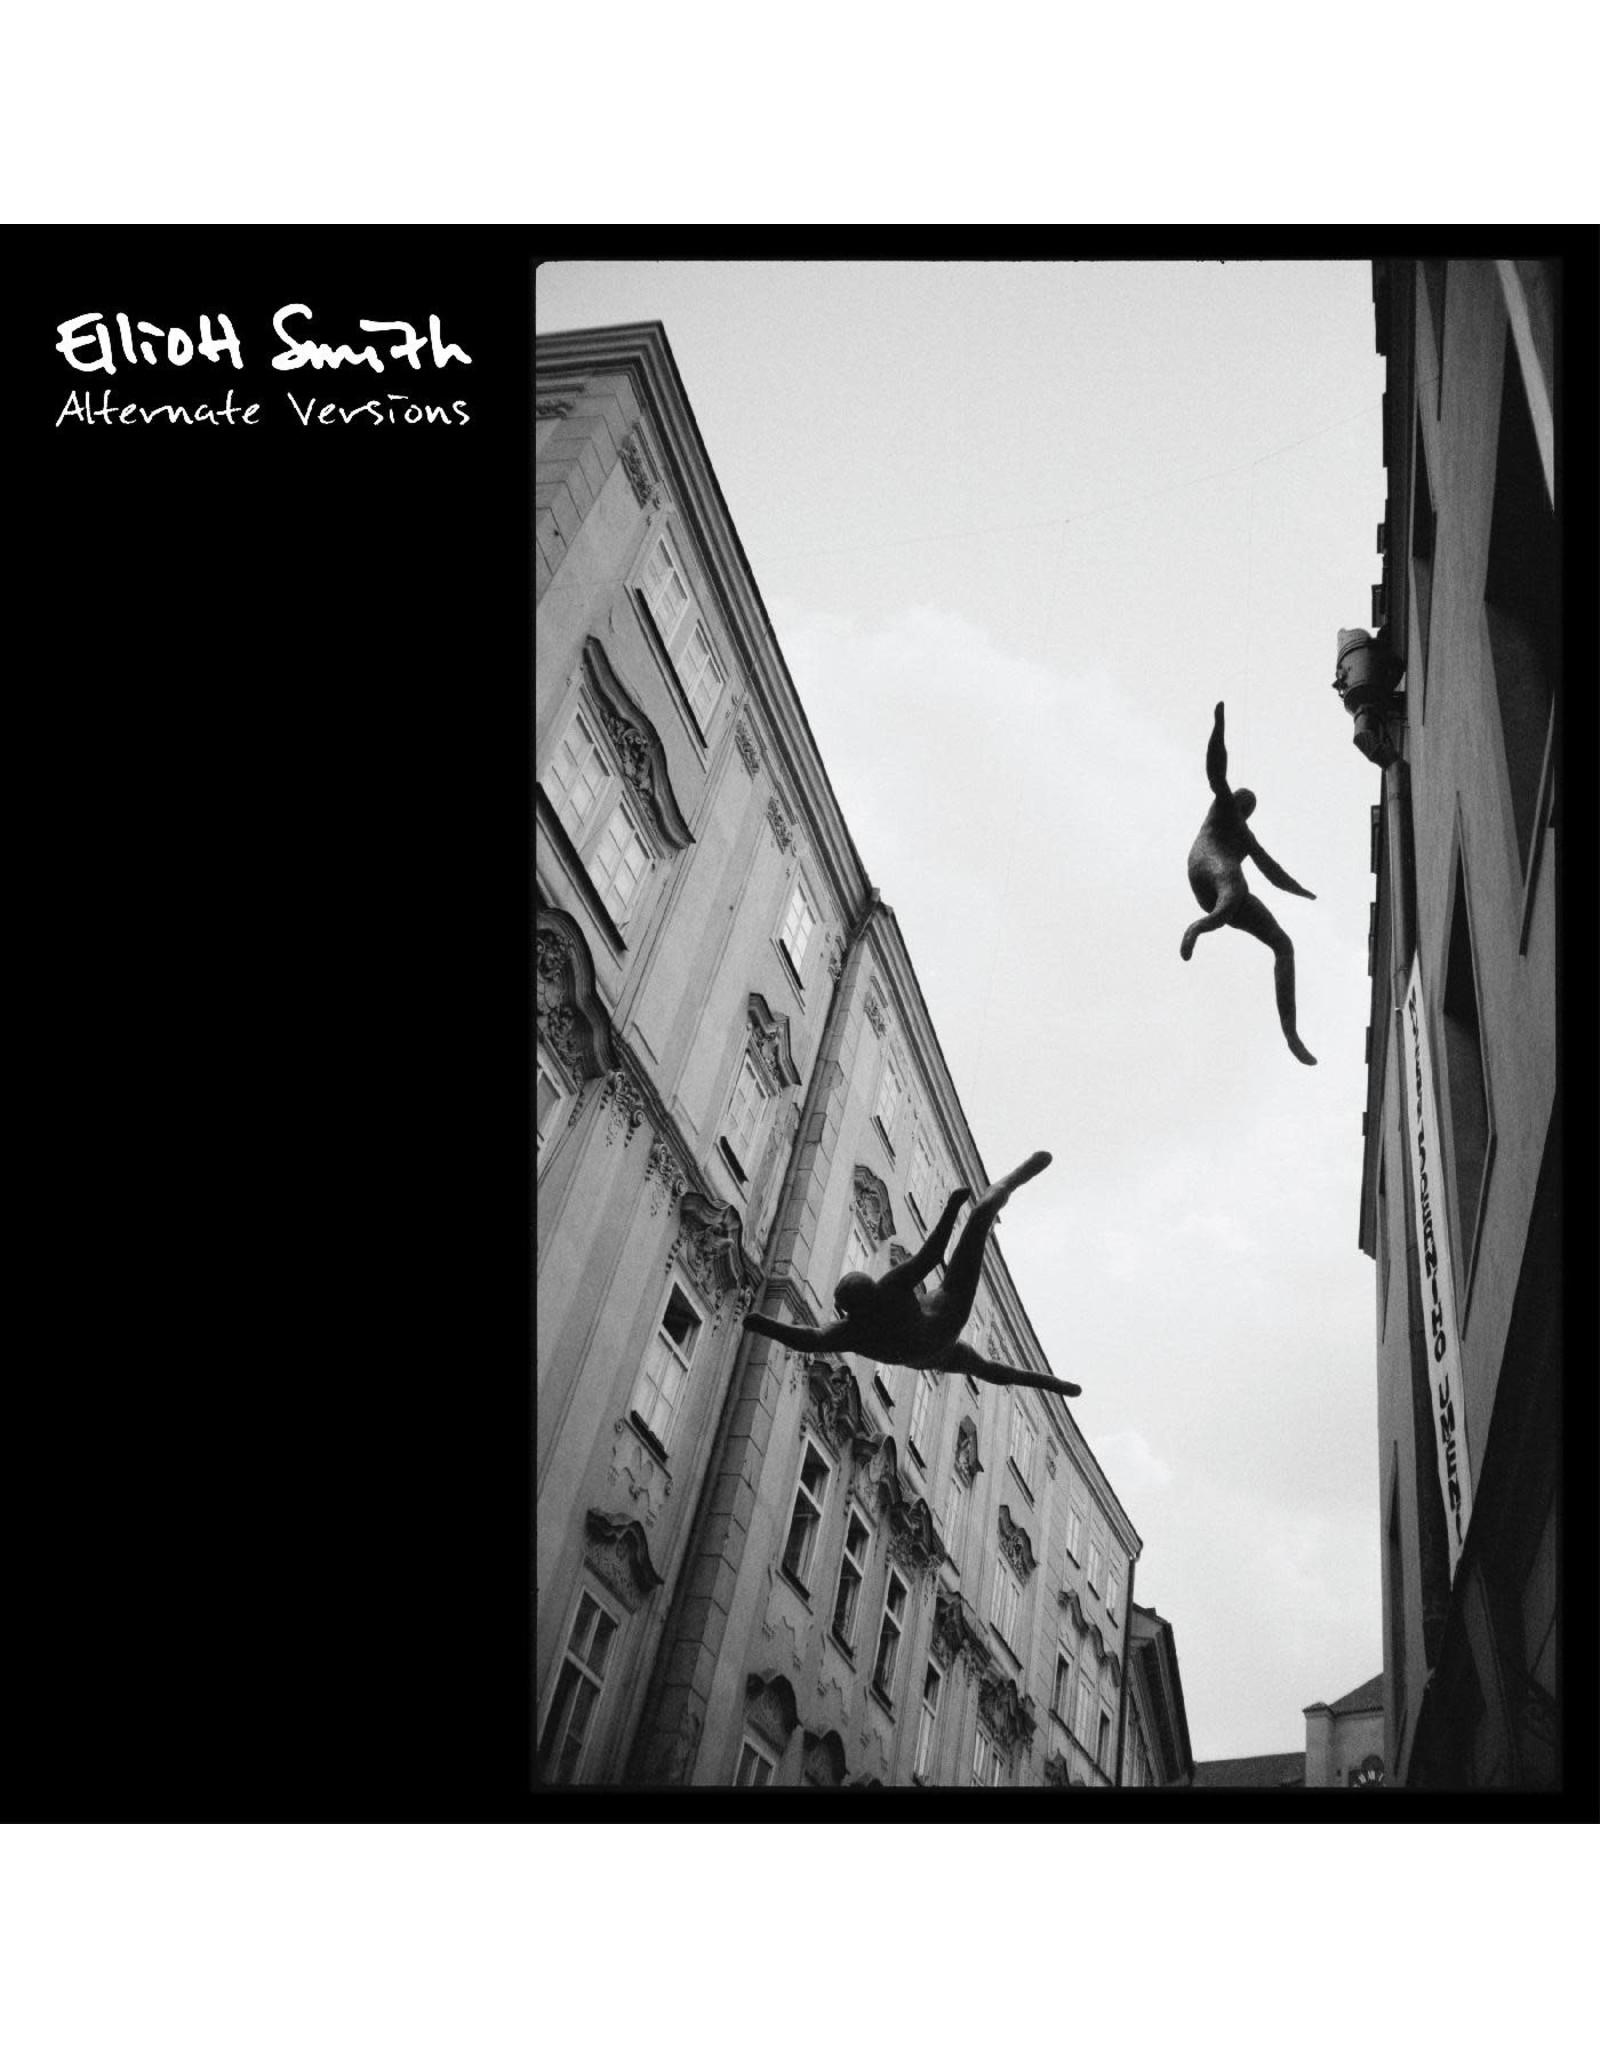 Smith, Elliot - Alternate Versions LP (Black Friday RSD on Coloured Vinyl)